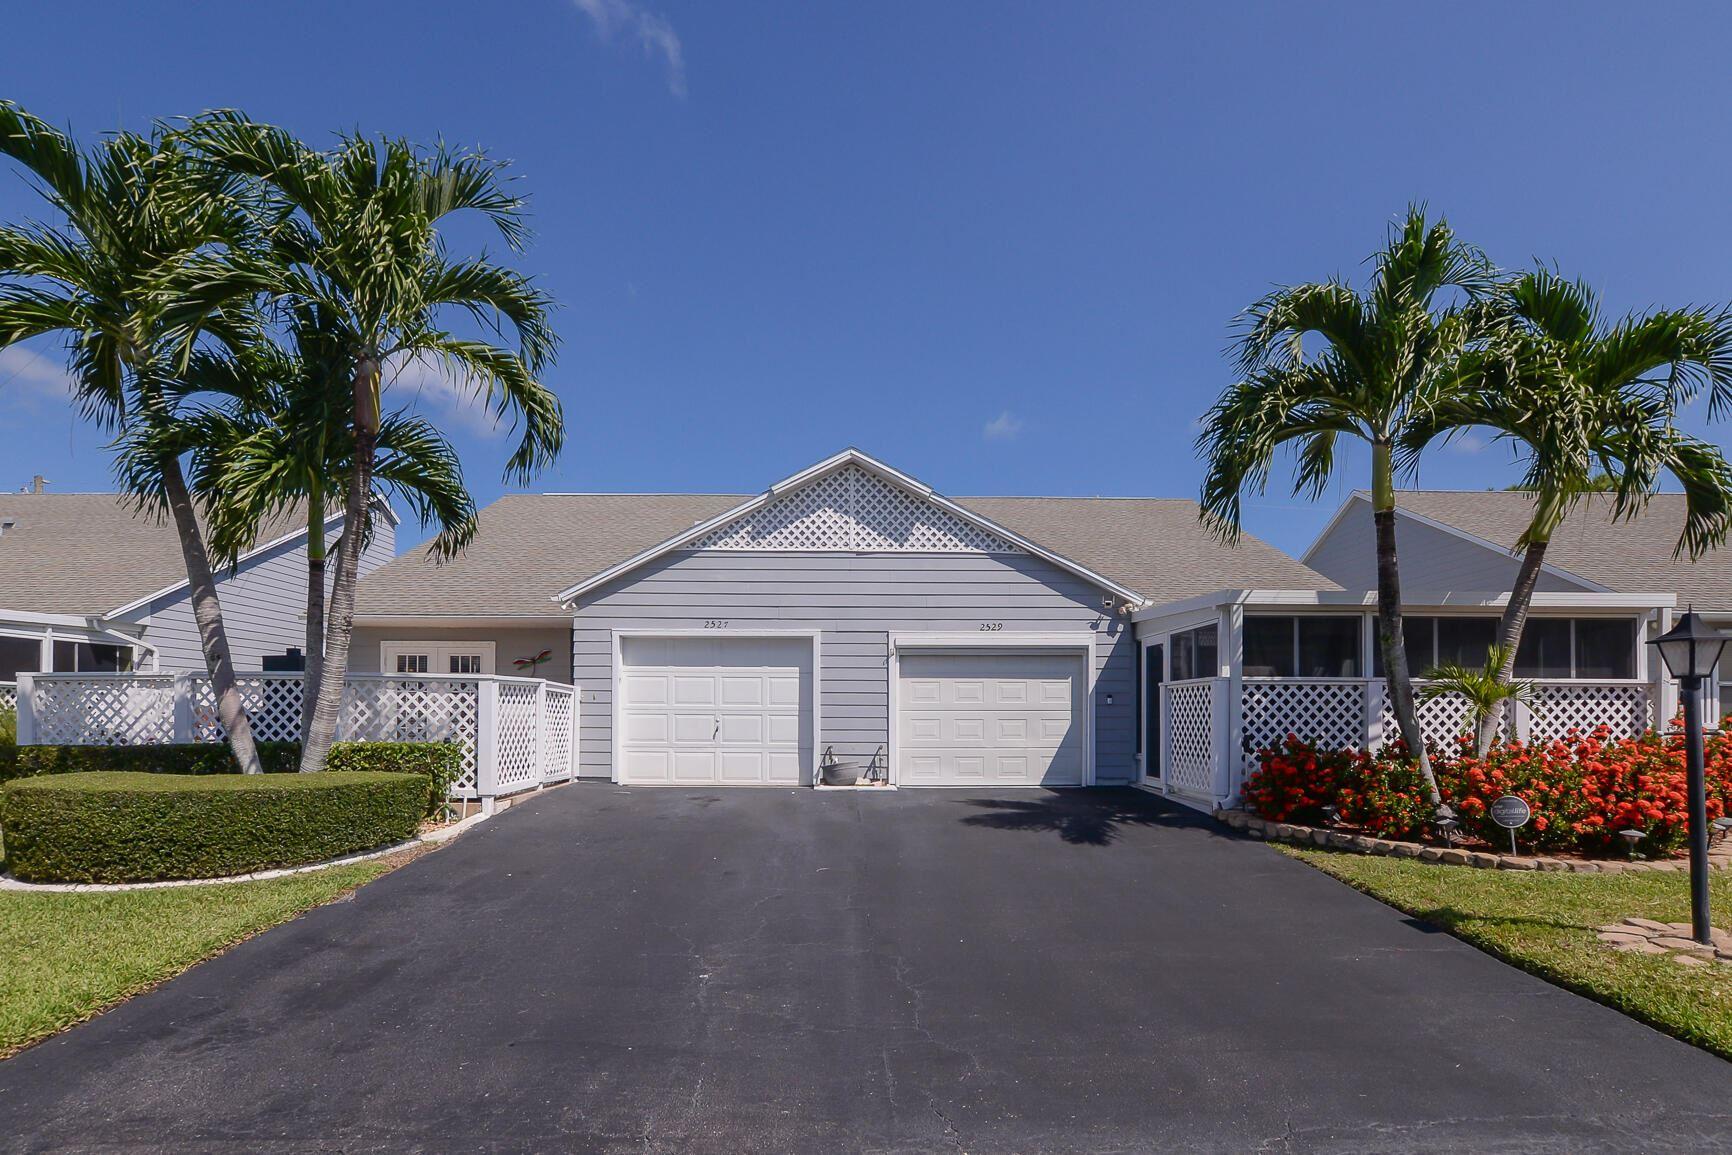 2527 SE Tropical East Circle E, Port Saint Lucie, FL 34952 - MLS#: RX-10746115